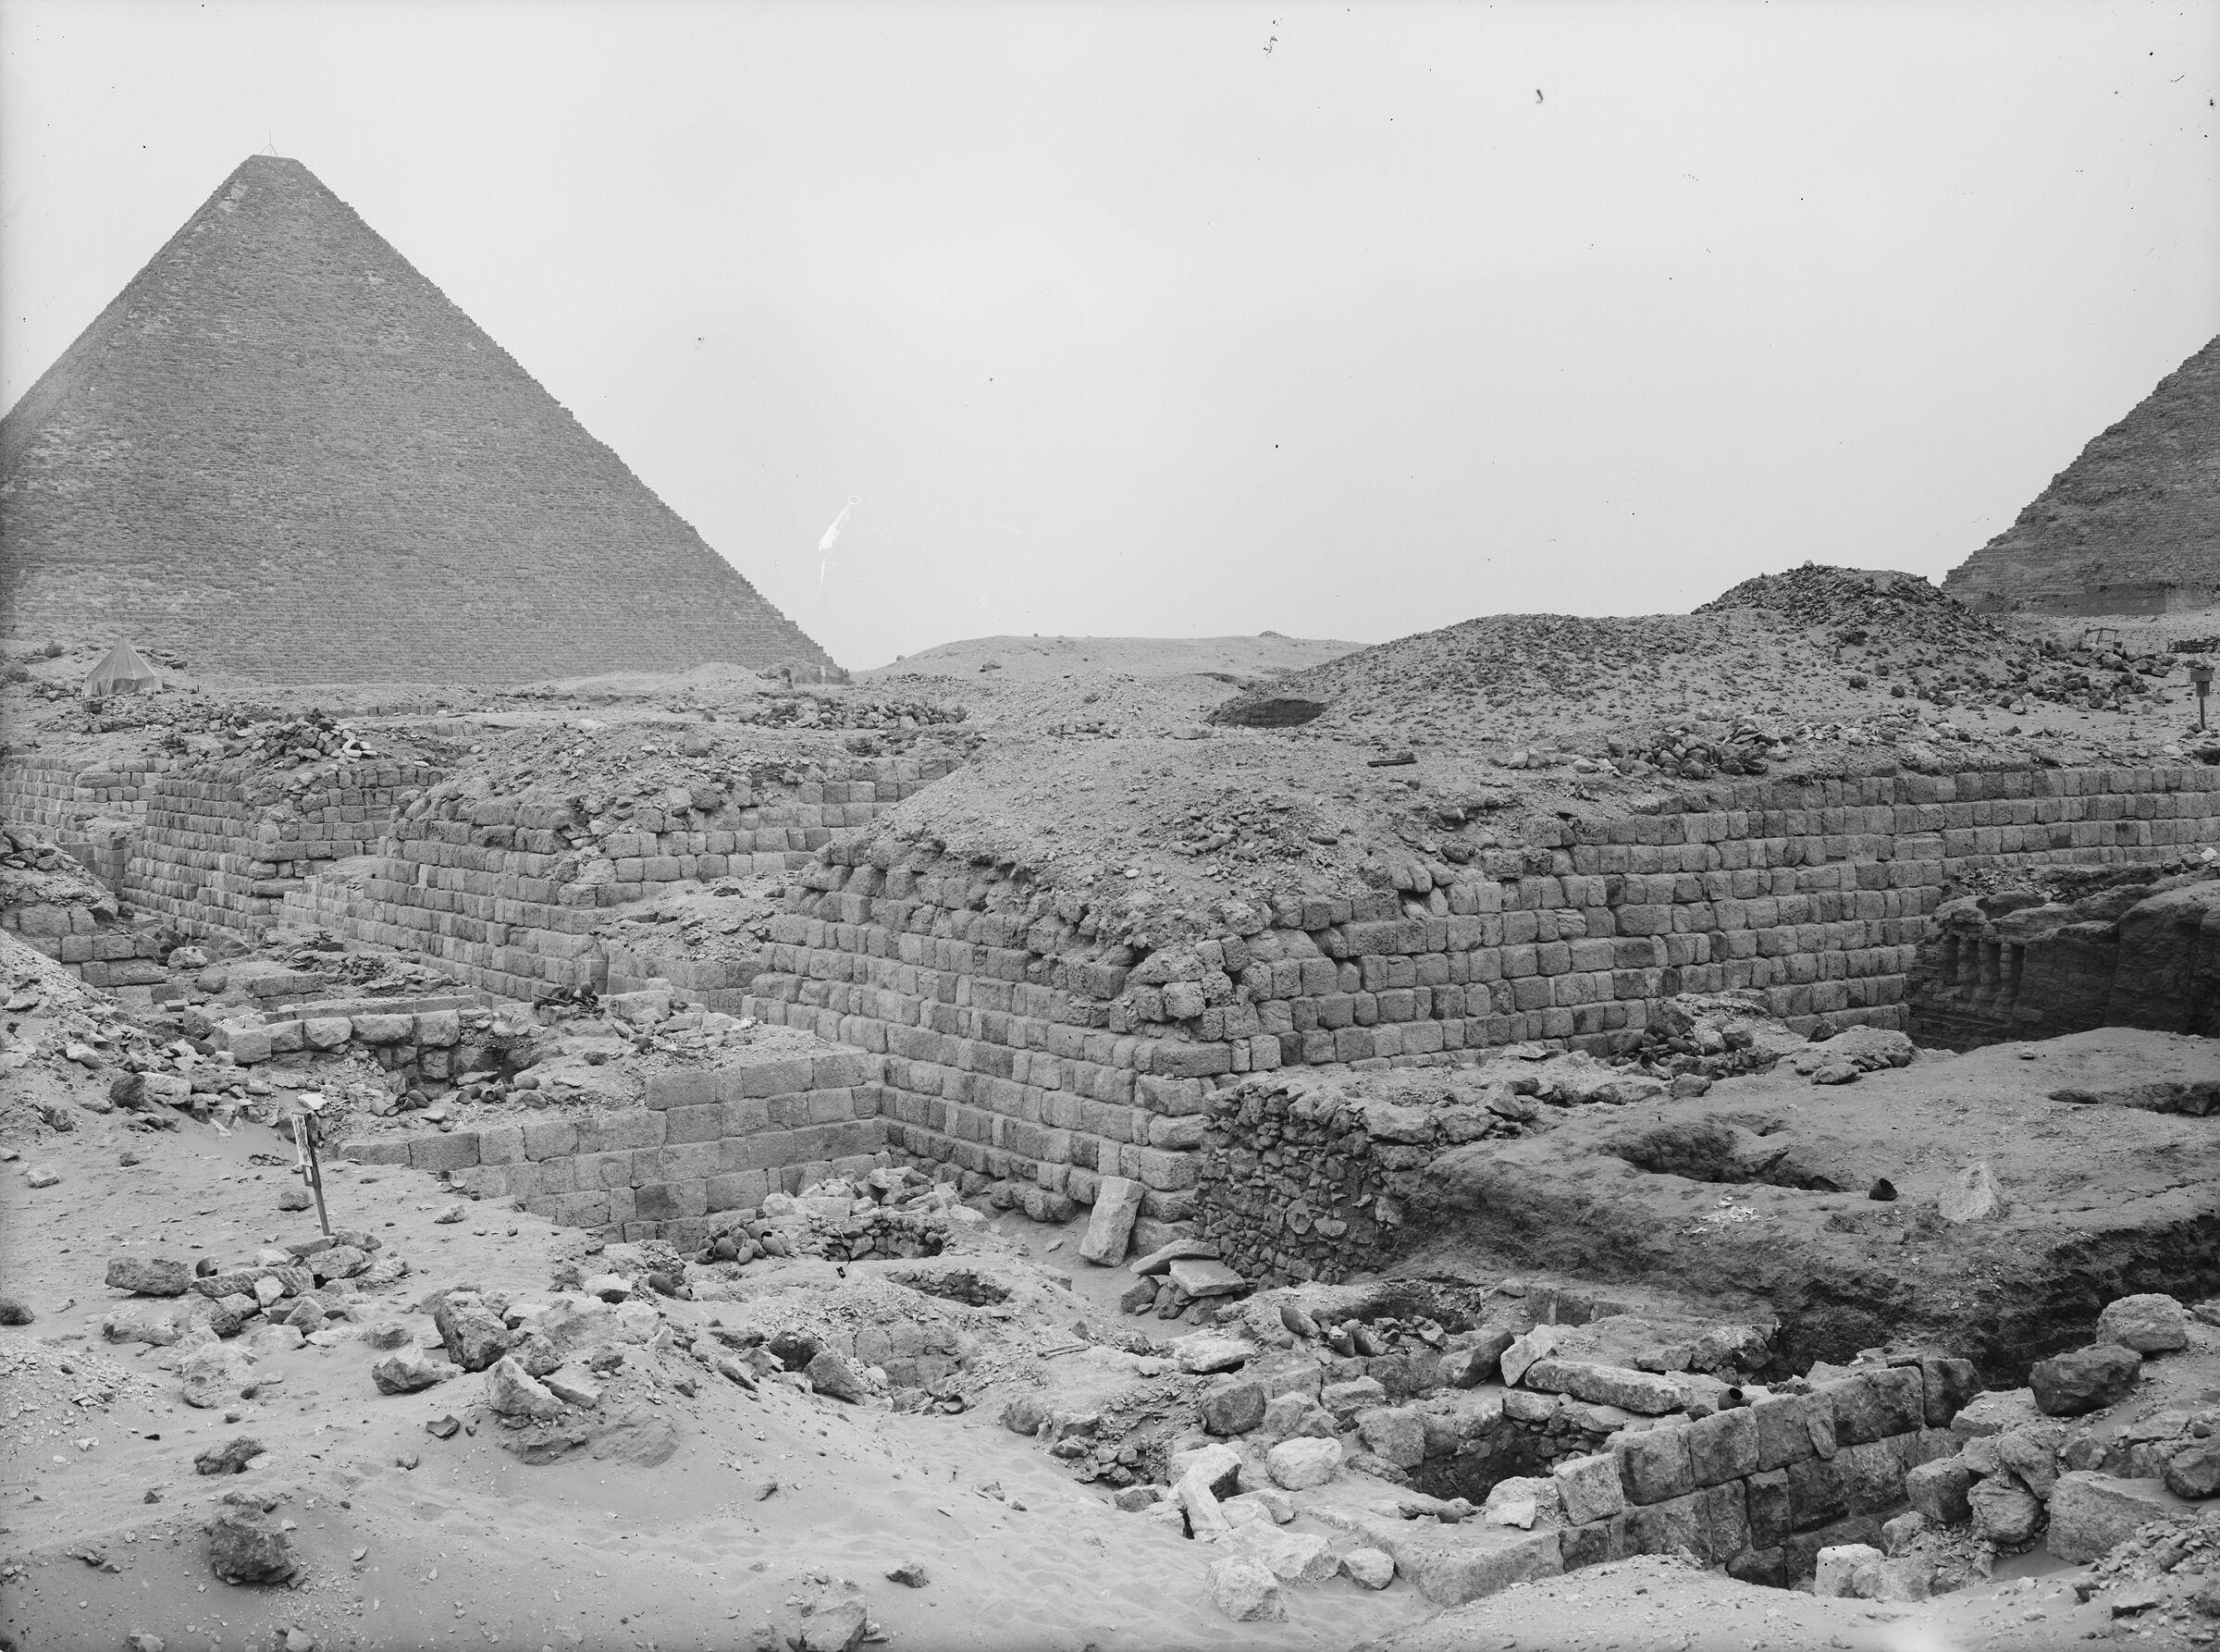 Western Cemetery: Site: Giza; View: G 1209, G 1207, G 1205, G 1203, G 1404, G 1405, G 1407, G 1403